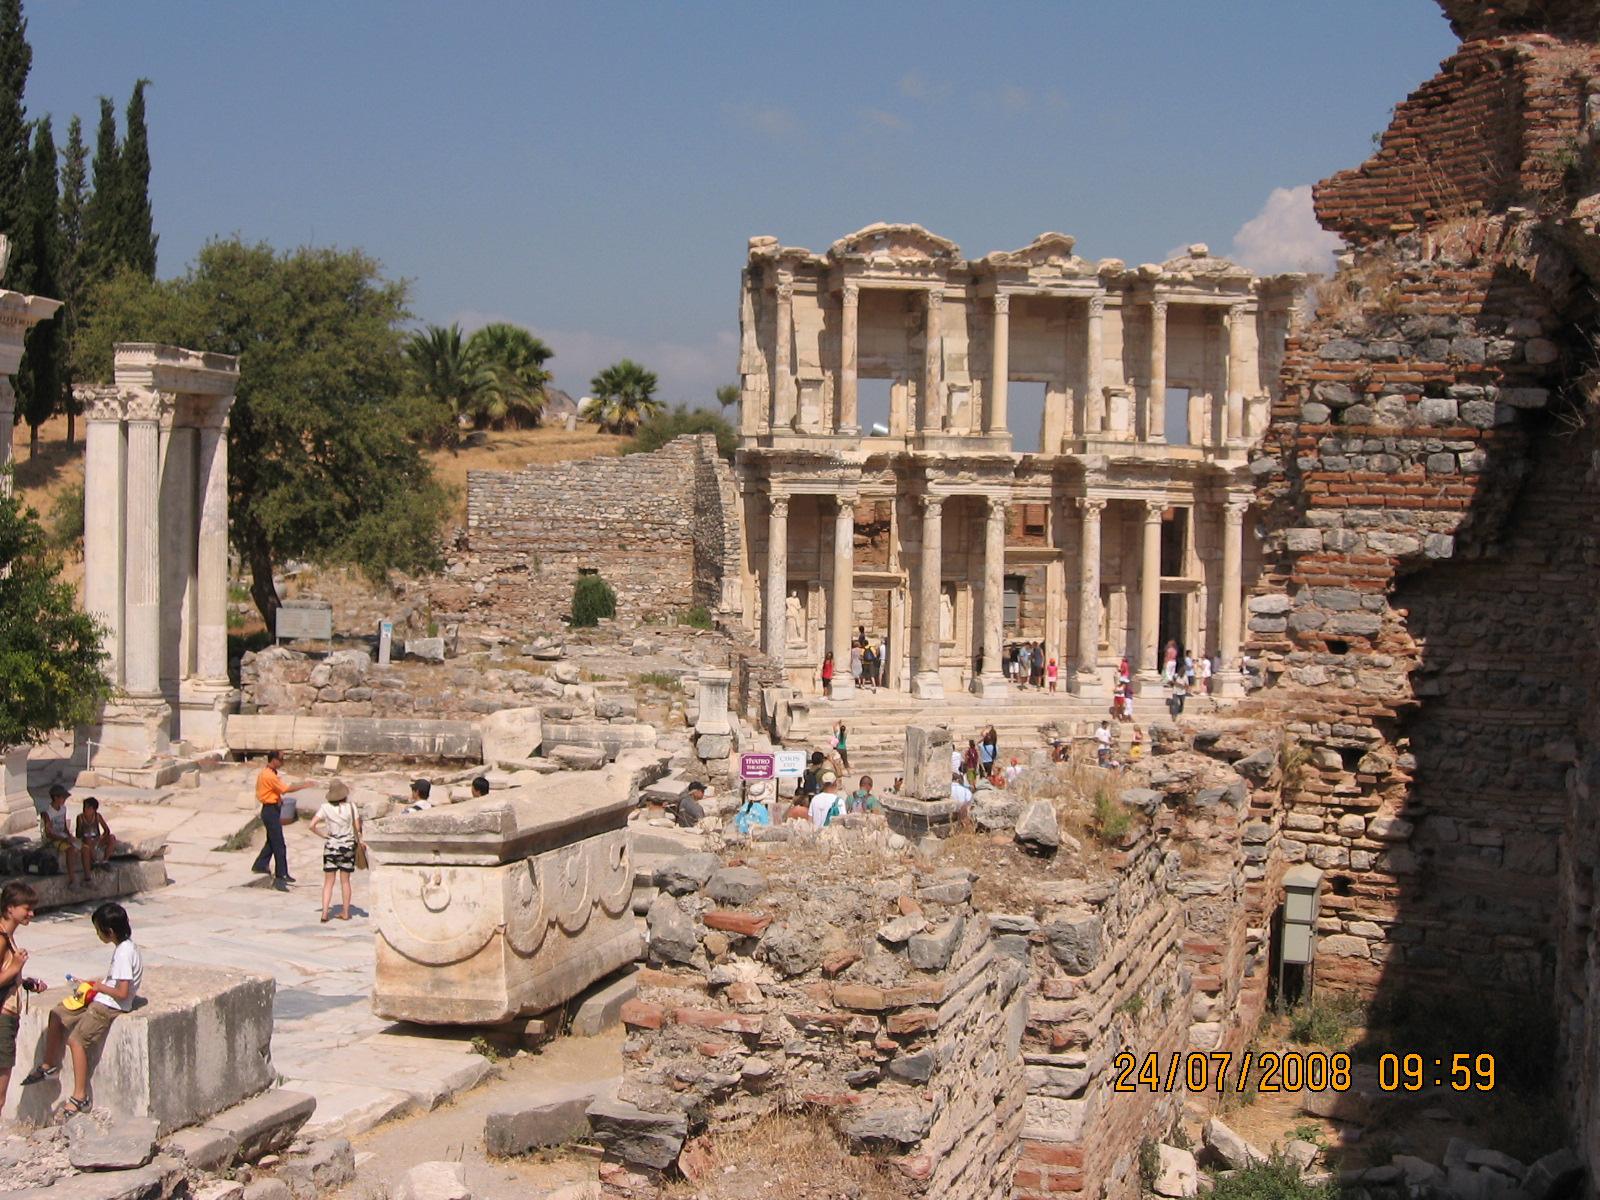 efes turcia harta Orasul Efes Turcia | Trecator prin lume efes turcia harta